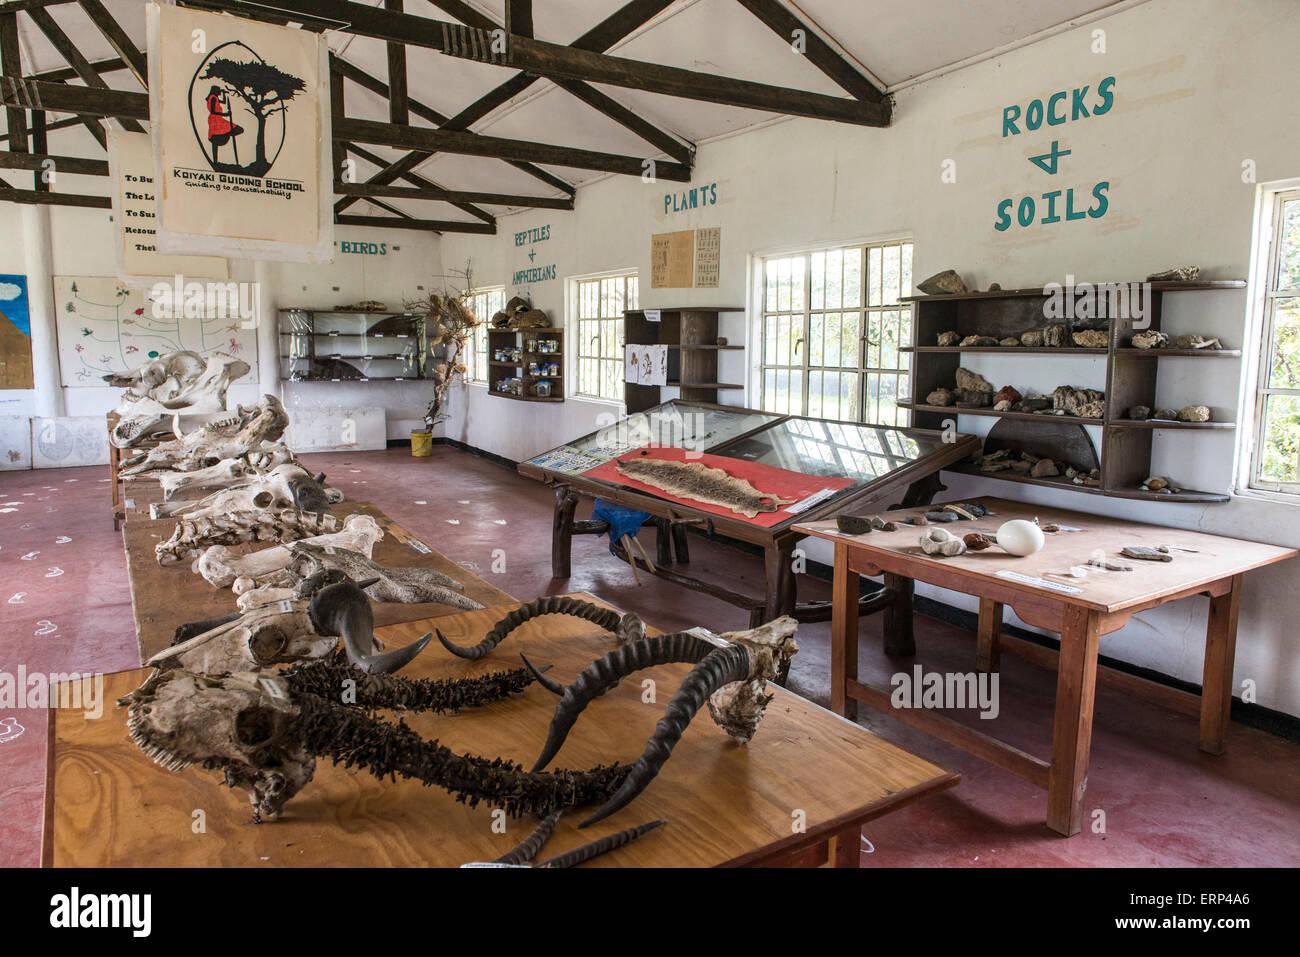 Koiyaki Guiding School Maasai Mara National Reserve in southern Kenya Africa - Stock Image